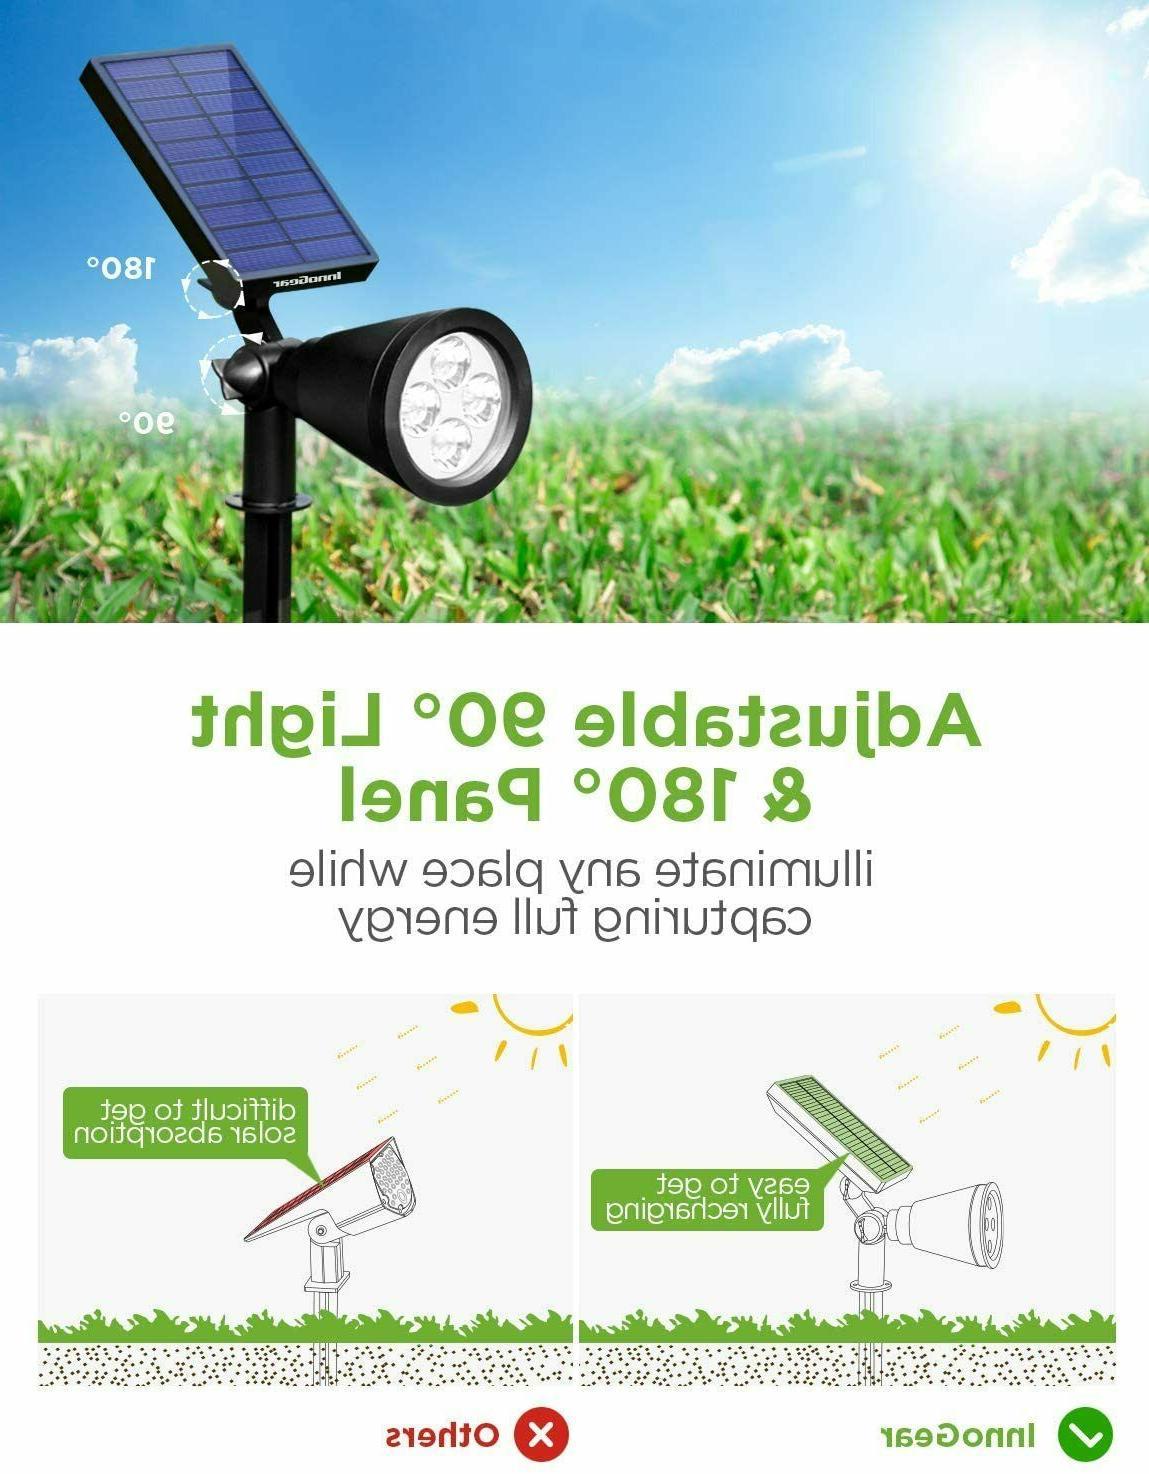 InnoGear Lights Outdoor, Upgraded Solar Powered Landscape